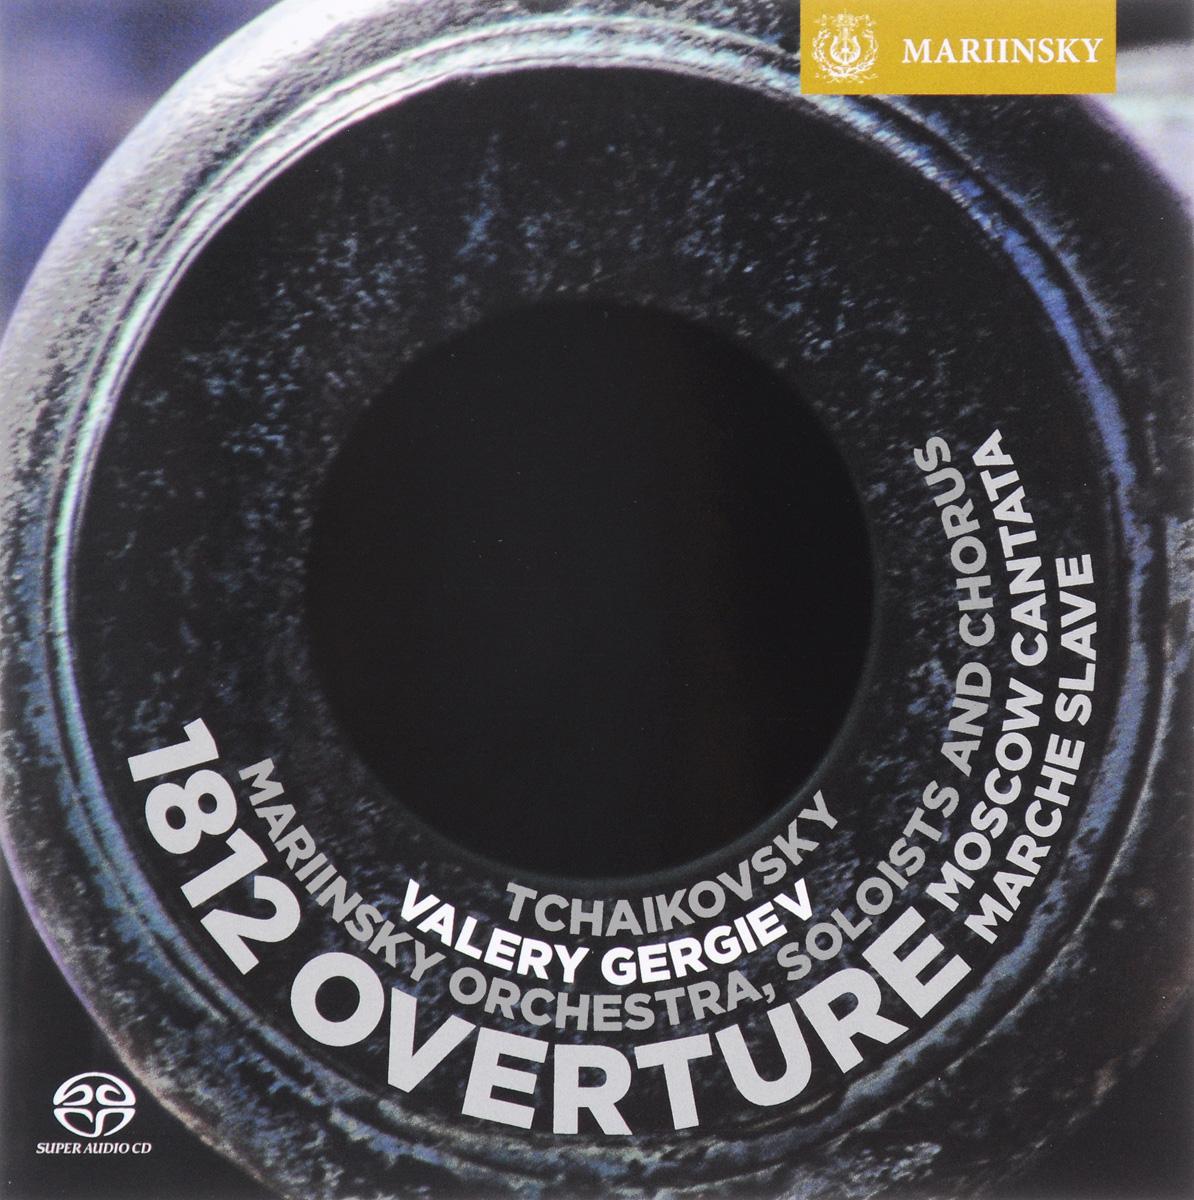 Valery Gergiev. Tchaikovsky. 1812 Overture tchaikovsky valery gergiev eugene onegin blu ray